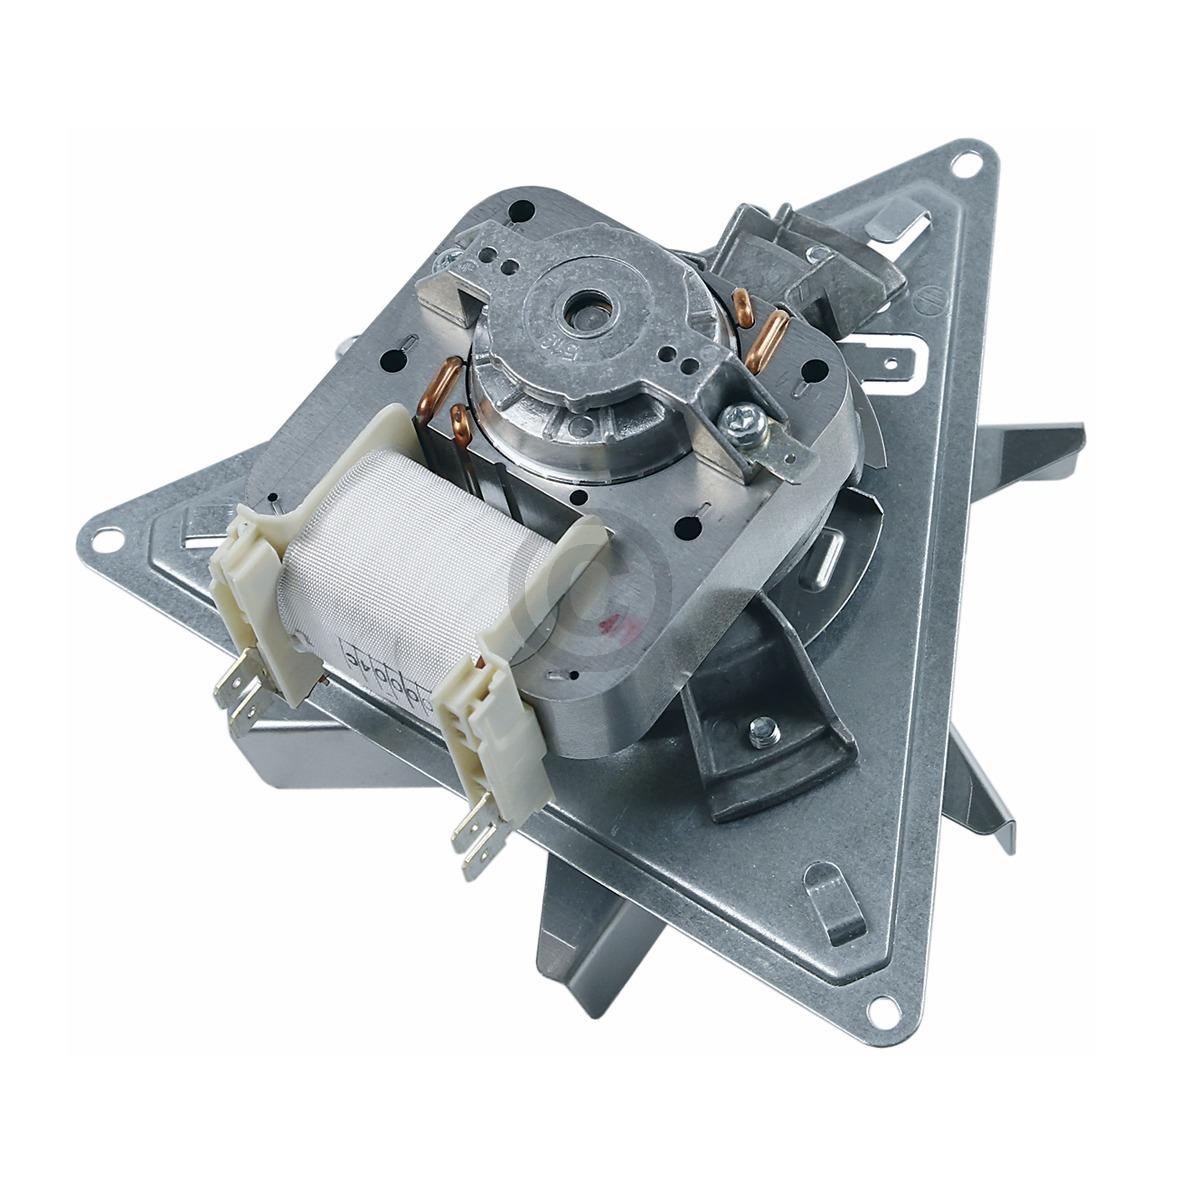 Heißluftherdventilator kpl. 00084701 084701 Bosch, Siemens, Neff